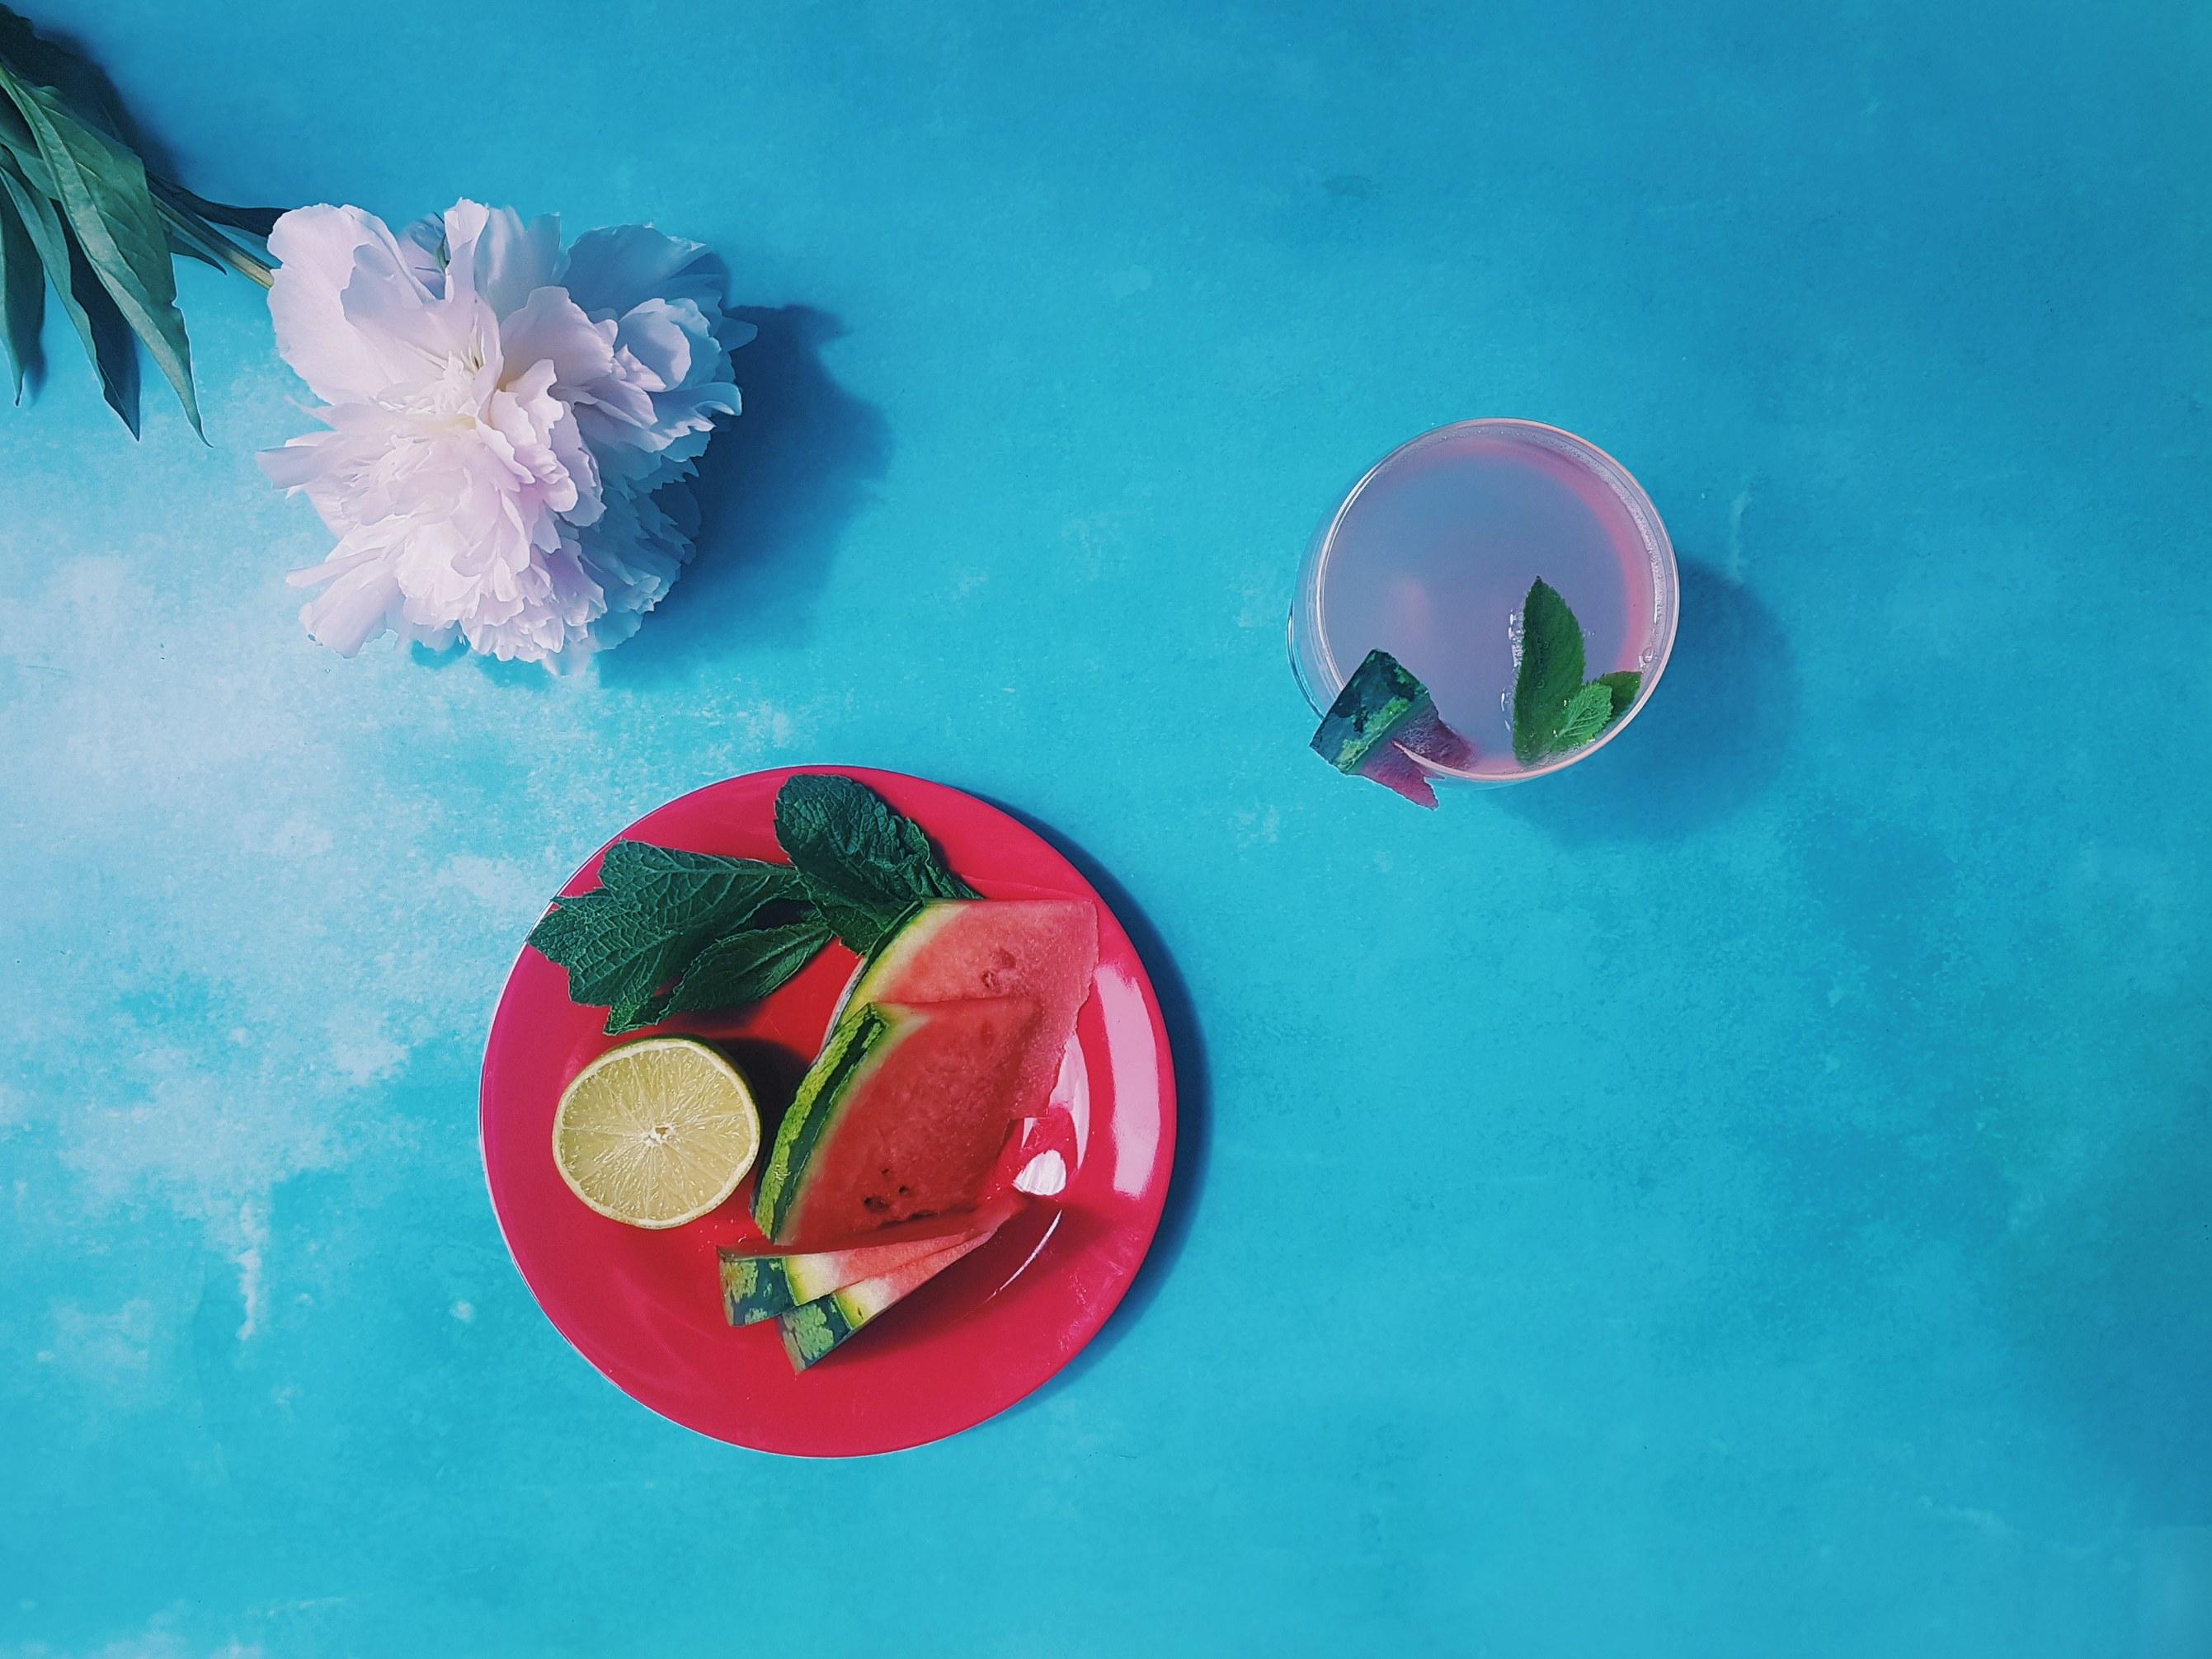 Watermelon-Burst-eteaket-Summer-19